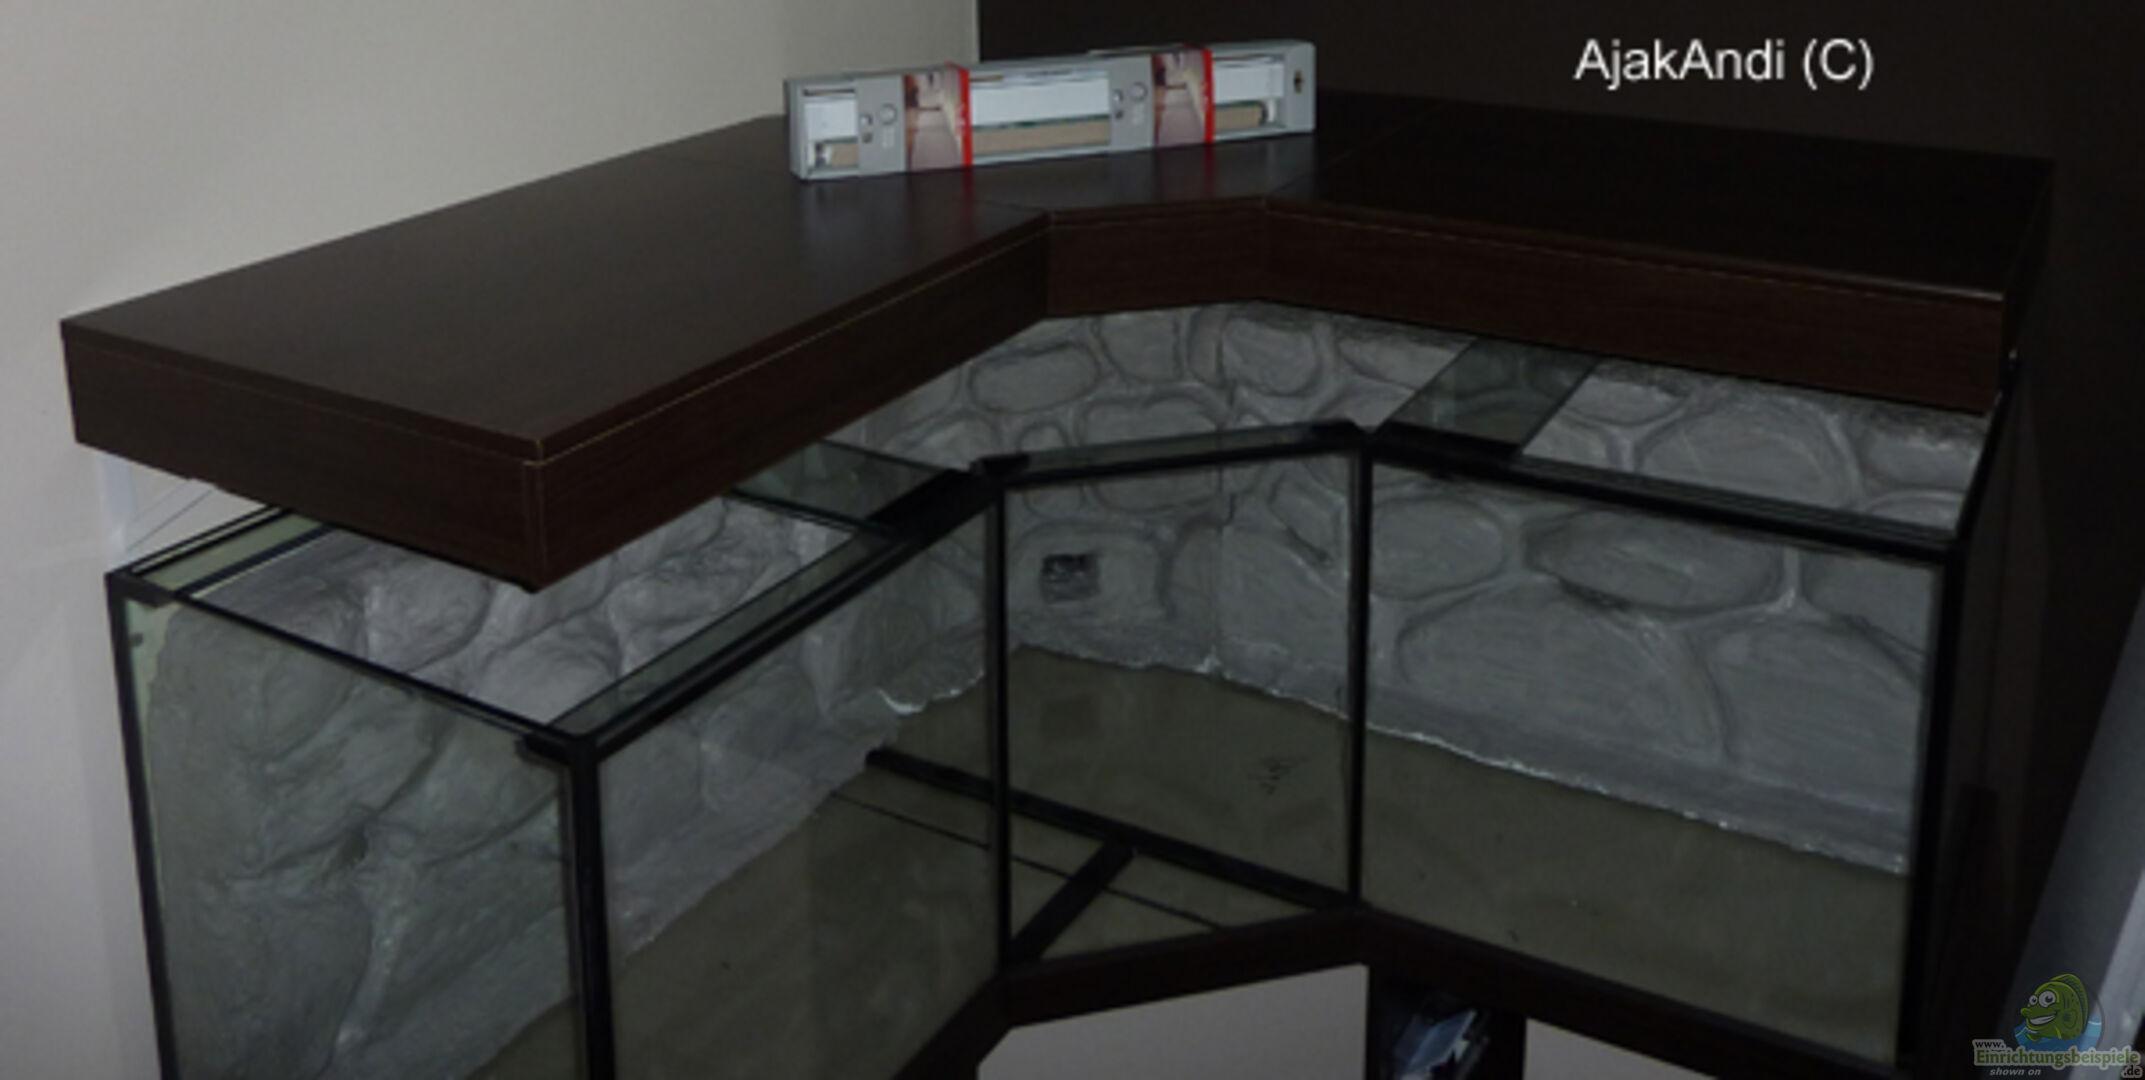 aquarium von ajakandi 28136 corner reef aufgel st. Black Bedroom Furniture Sets. Home Design Ideas